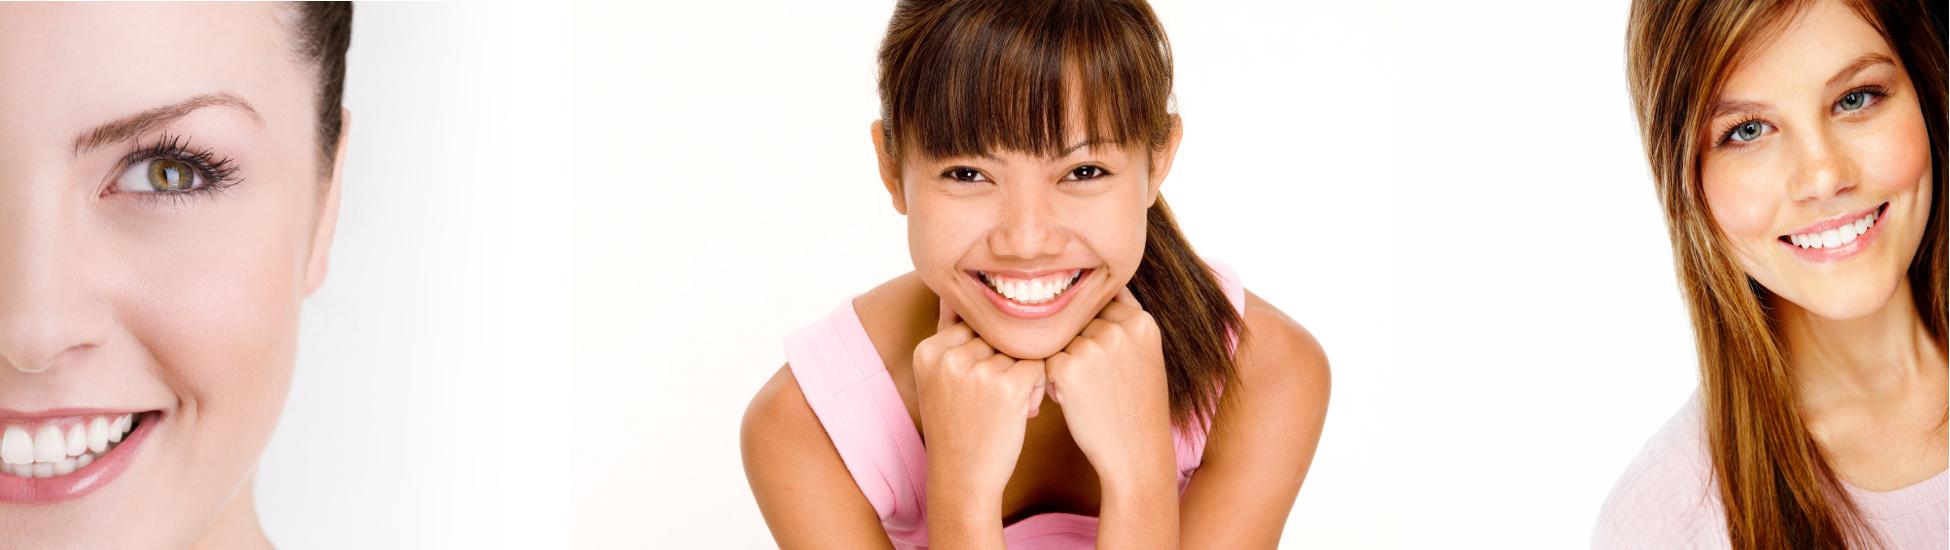 dentiste cannes centre dentaire cannes 06. Black Bedroom Furniture Sets. Home Design Ideas